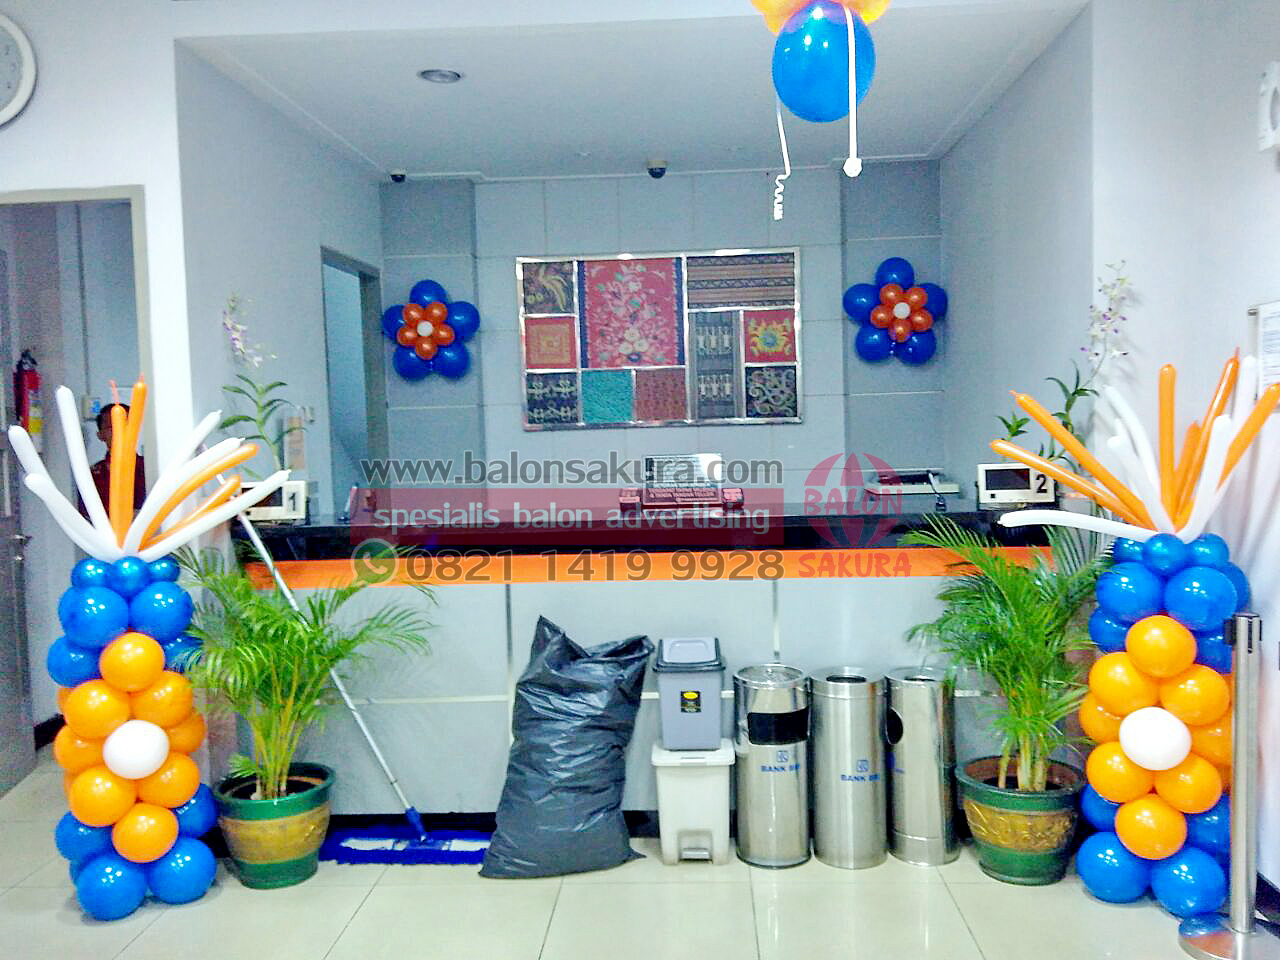 dekorasi balon bank